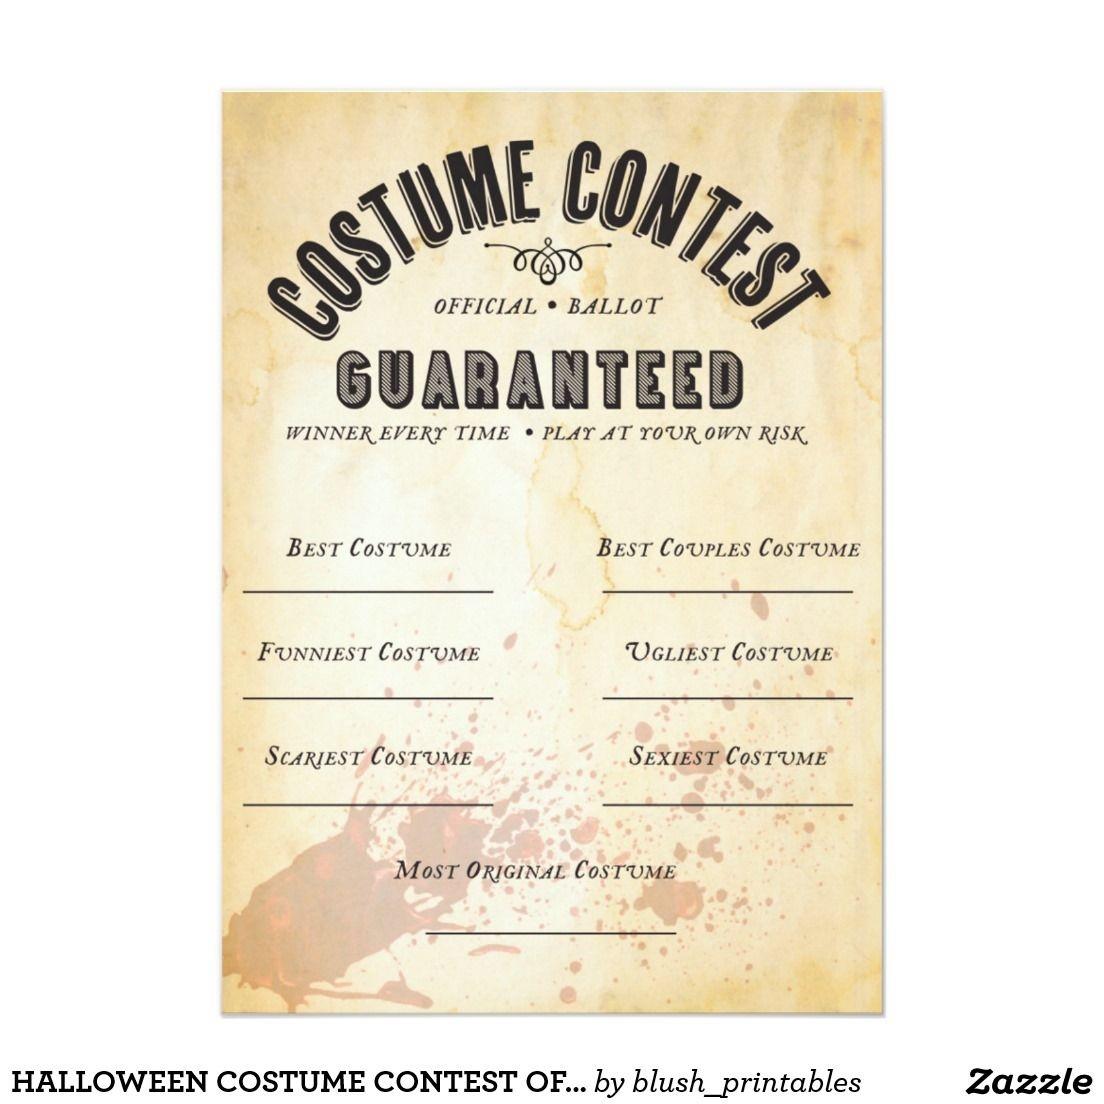 Halloween Costume Contest Ballot & Halloween Costume Award - Best Costume Certificate Printable Free